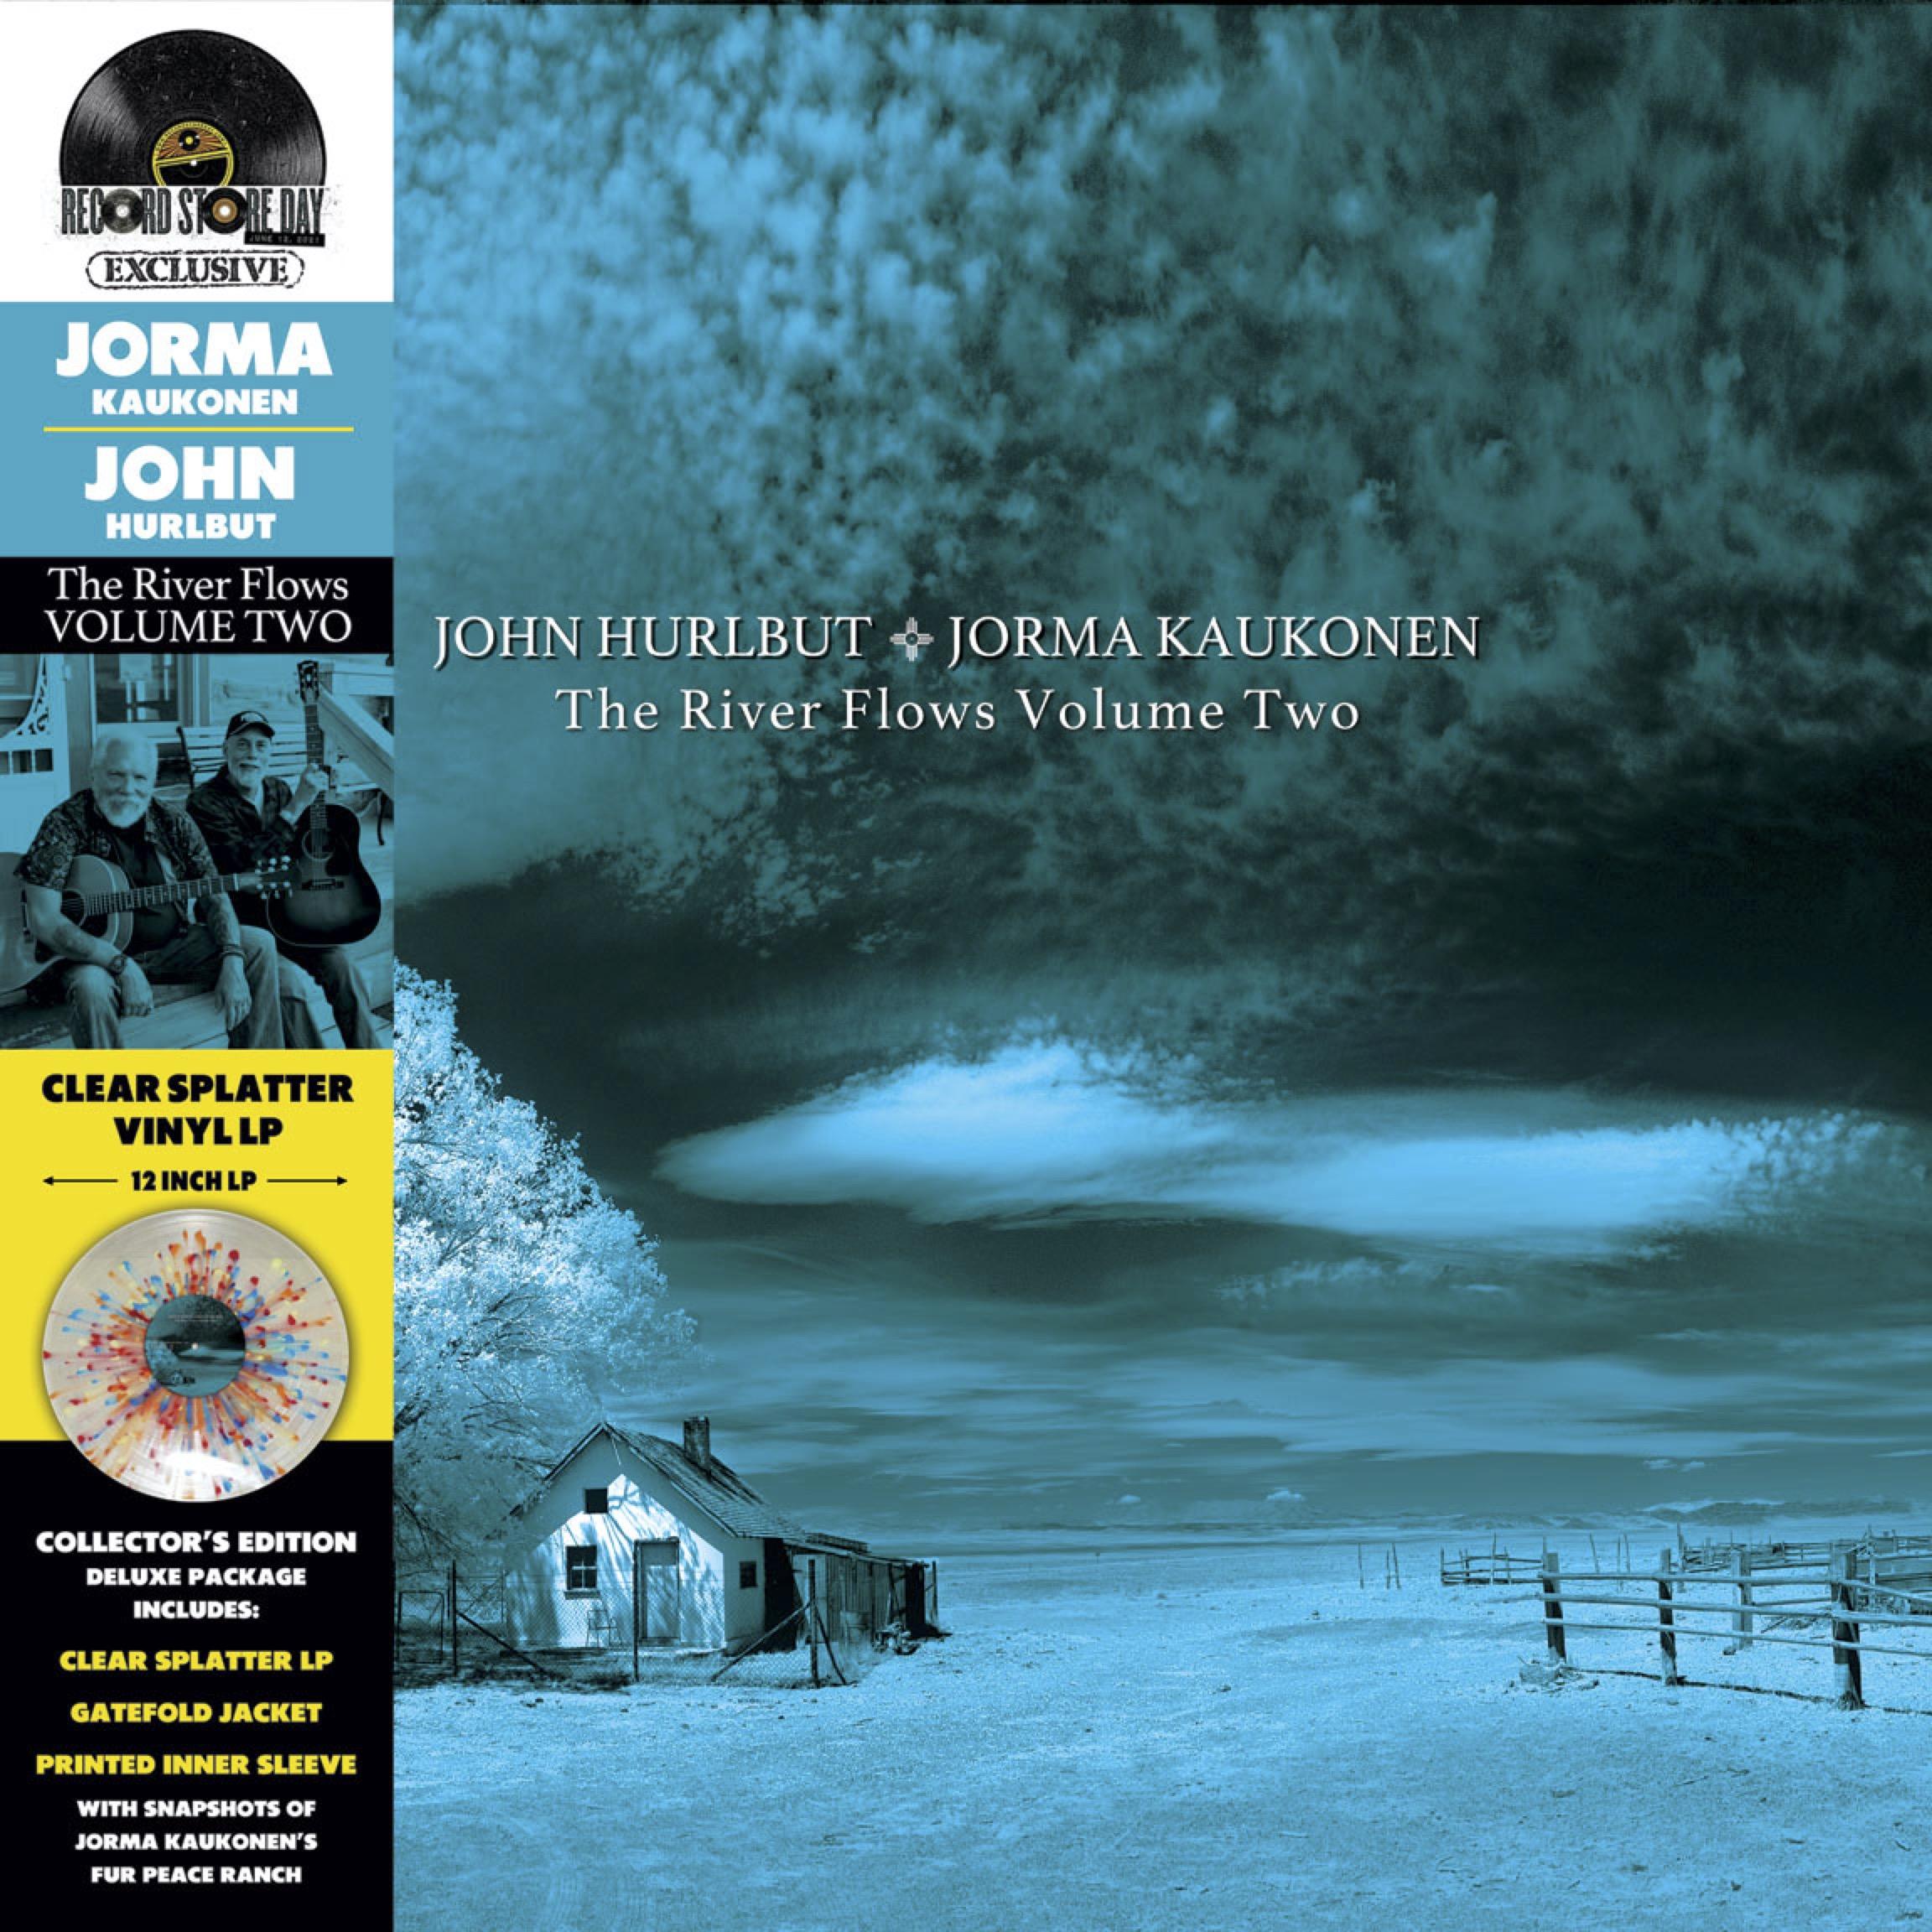 John Hurlbut & Jorma Kaukonen - River Flows Volume Two [LTD LP]